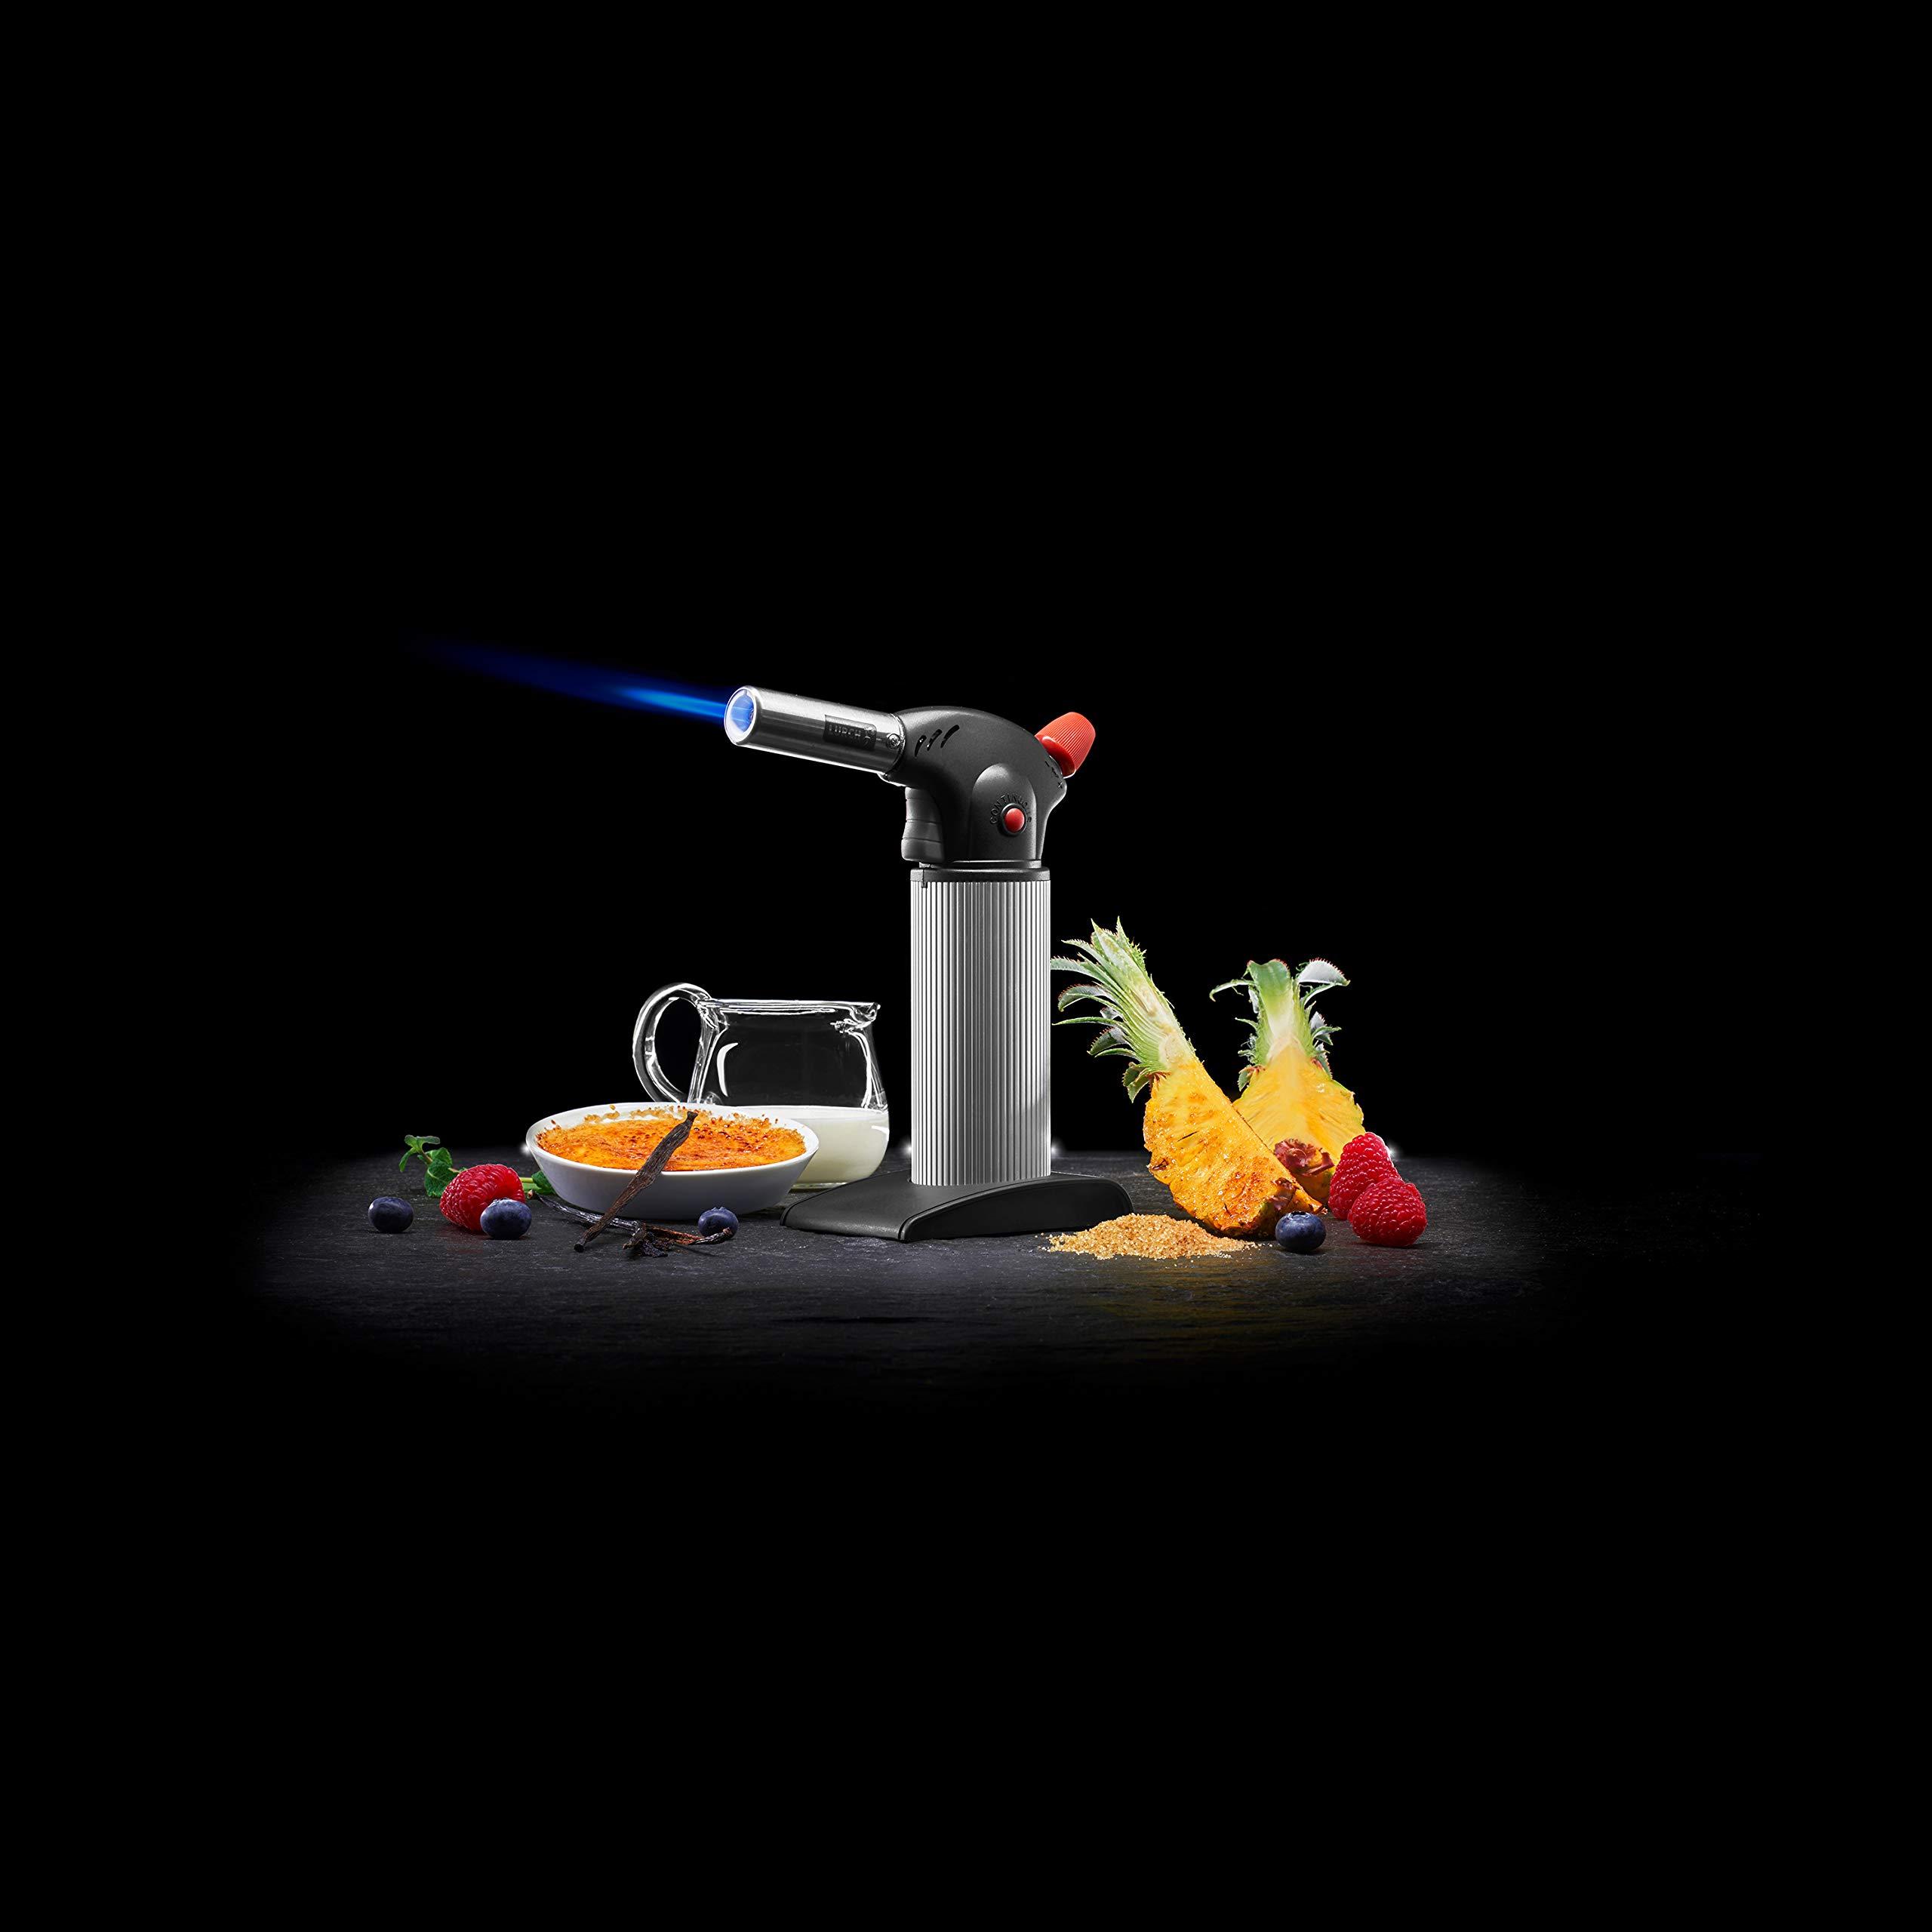 Lurch Germany Professional Gas Kitchen Torch, Black